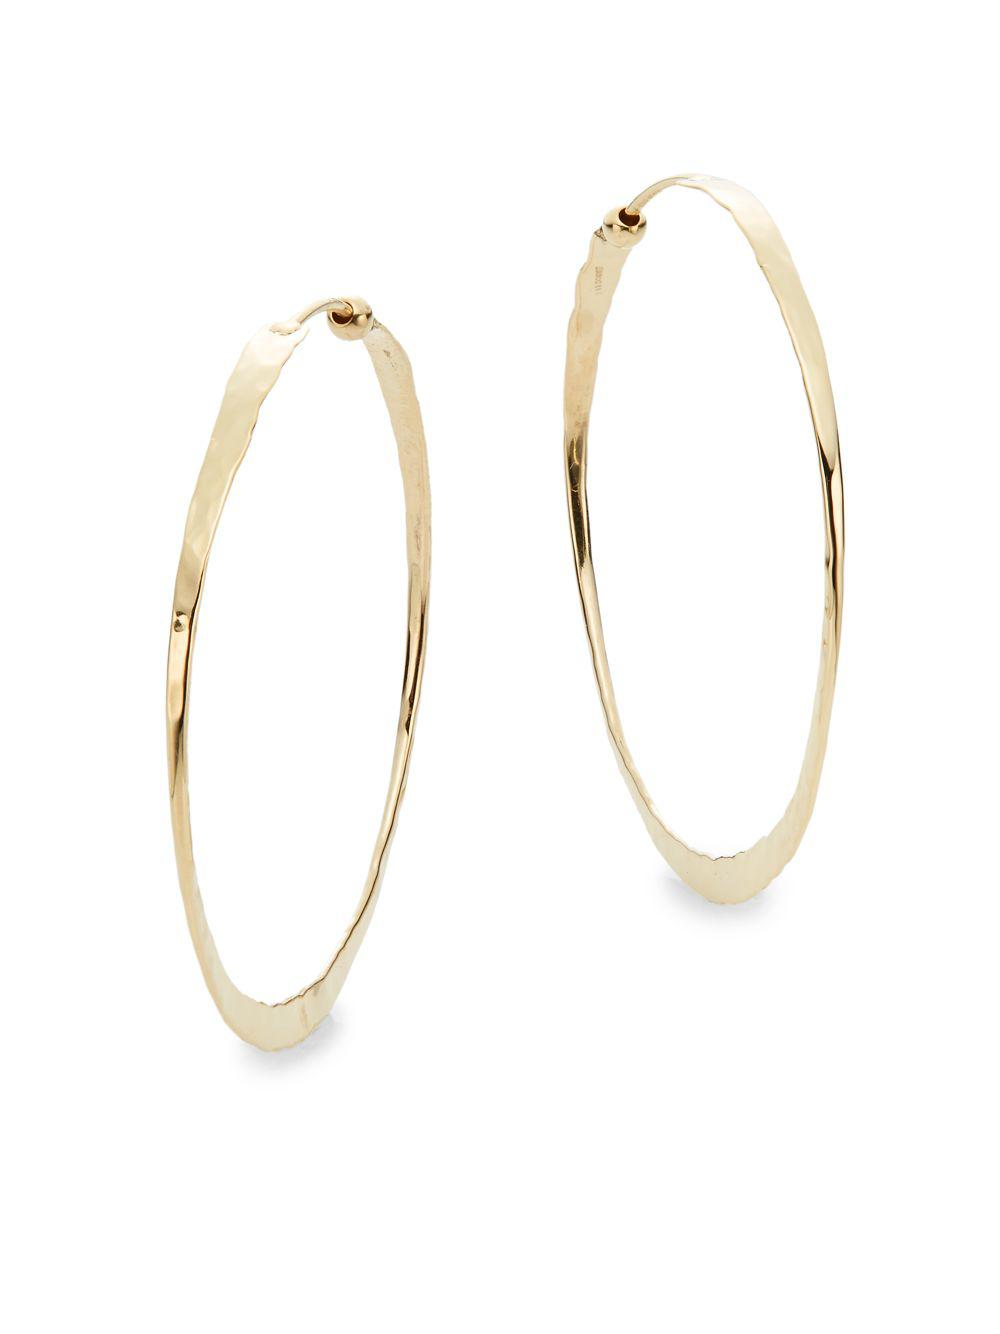 Saks Fifth Avenue Women S Metallic 14k Yellow Gold Hammered Hoop Earrings